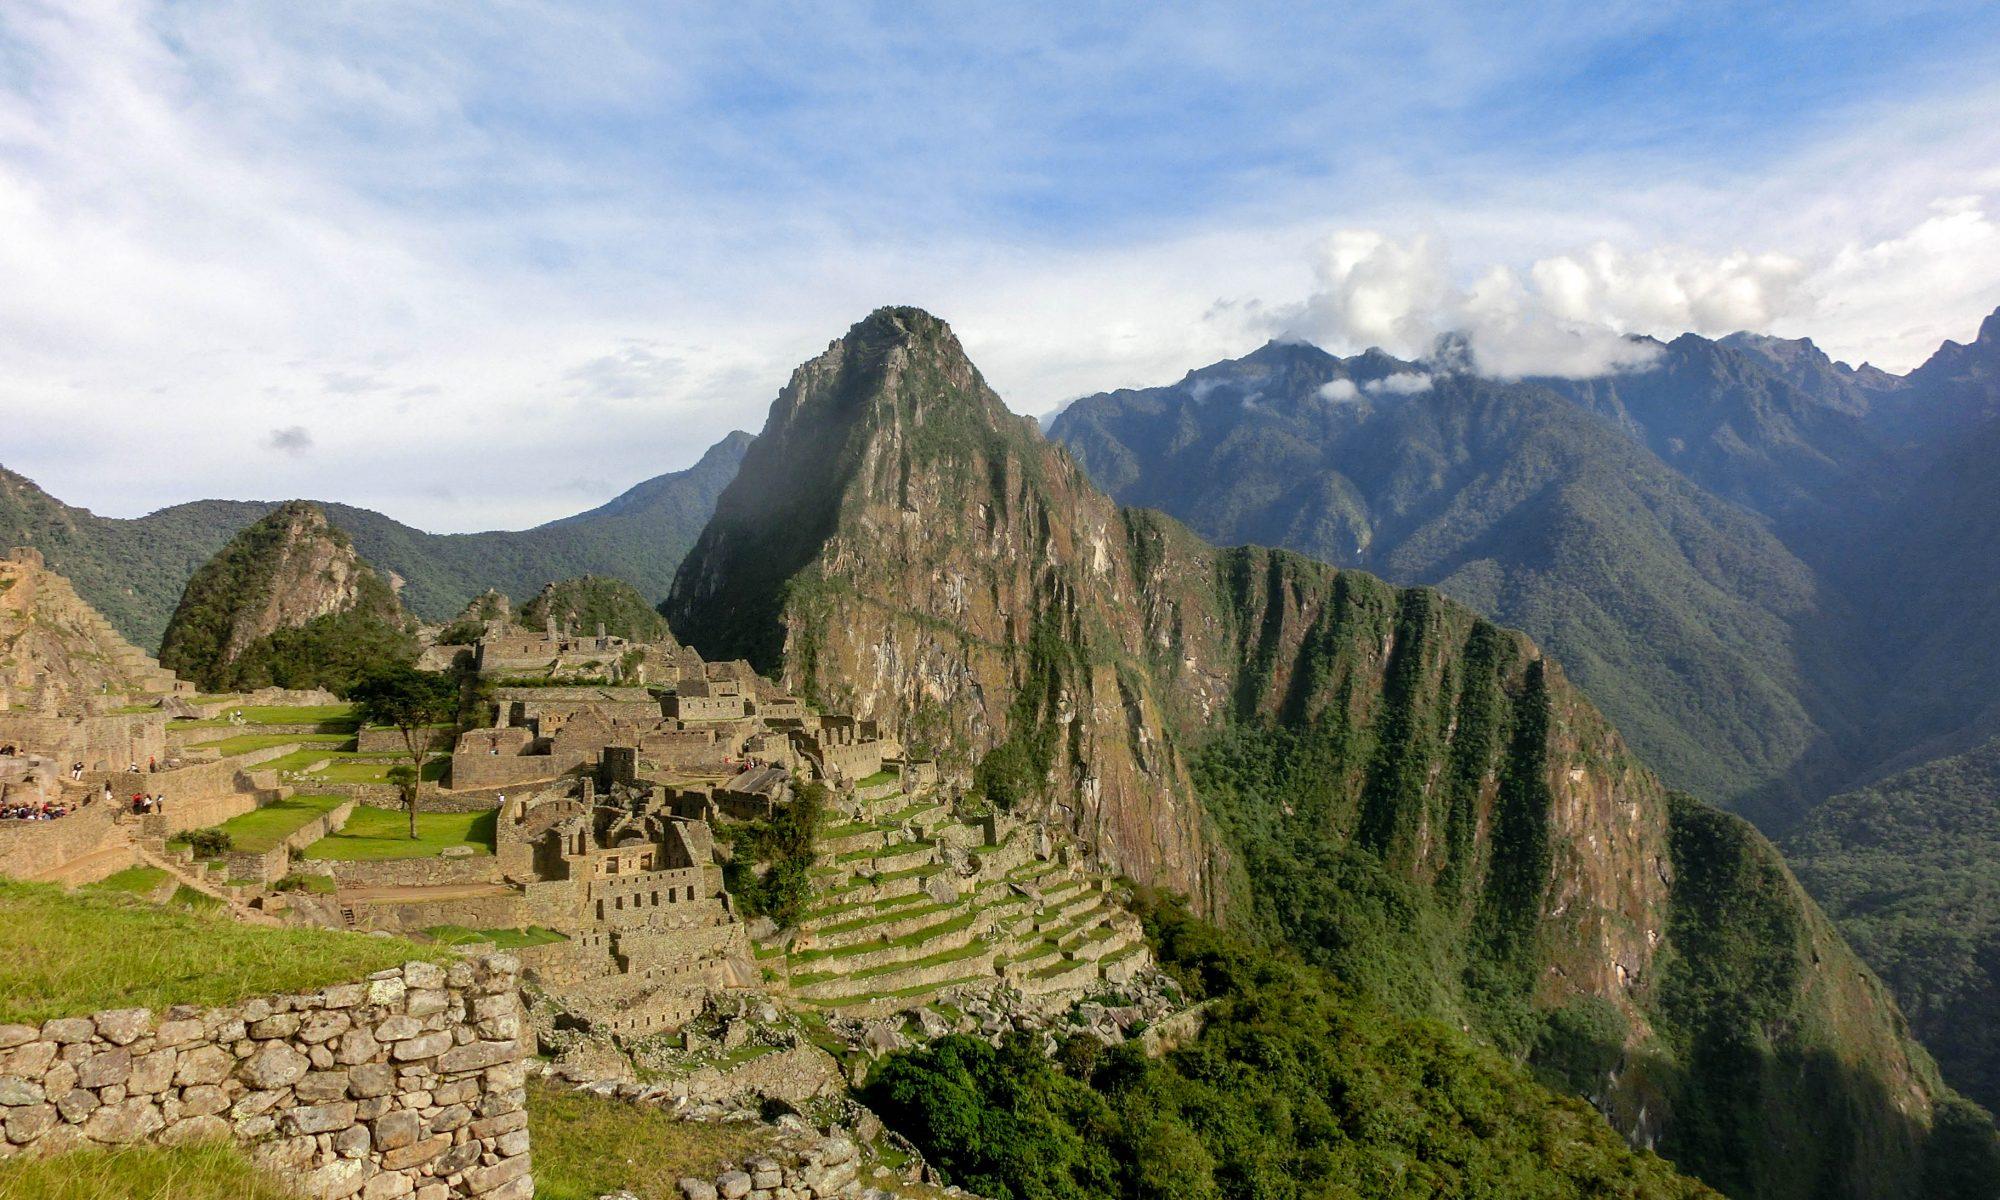 панорама към Мачу Пикчу